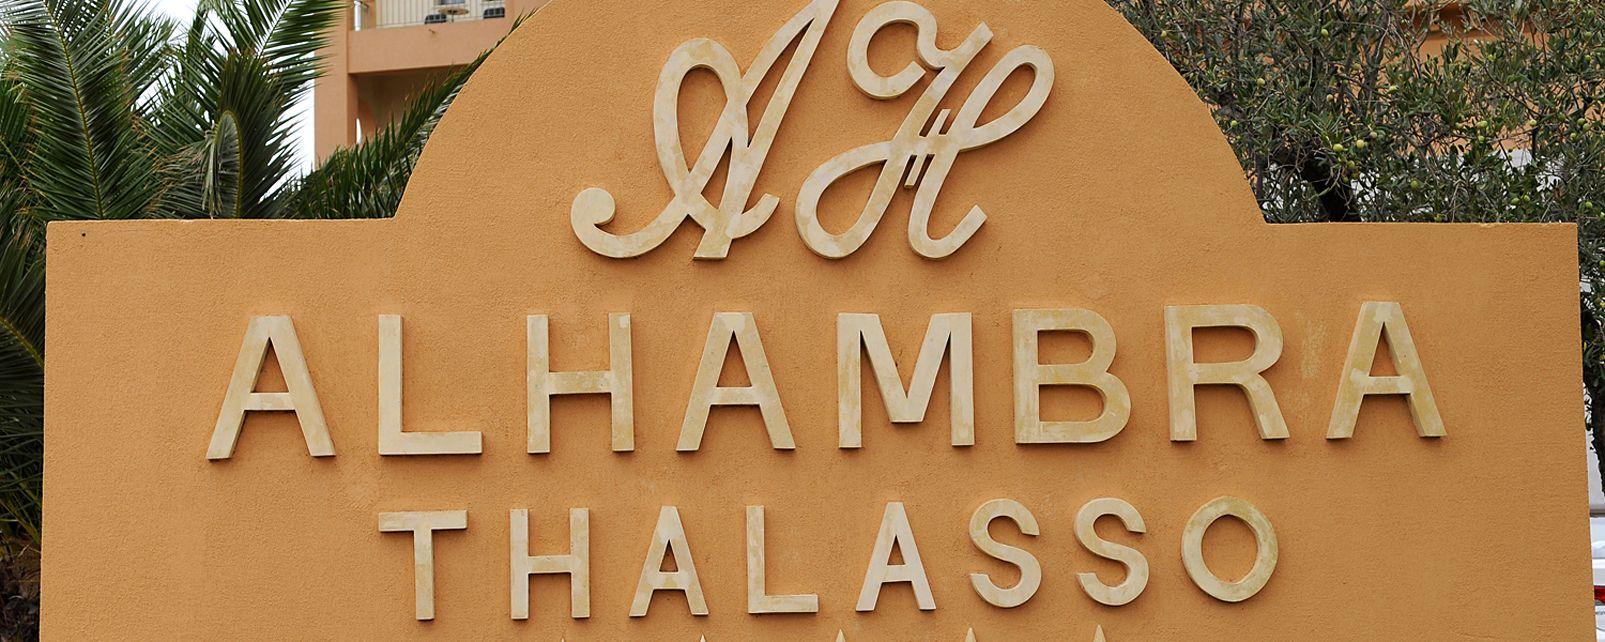 Hôtel Alhambra Thalasso